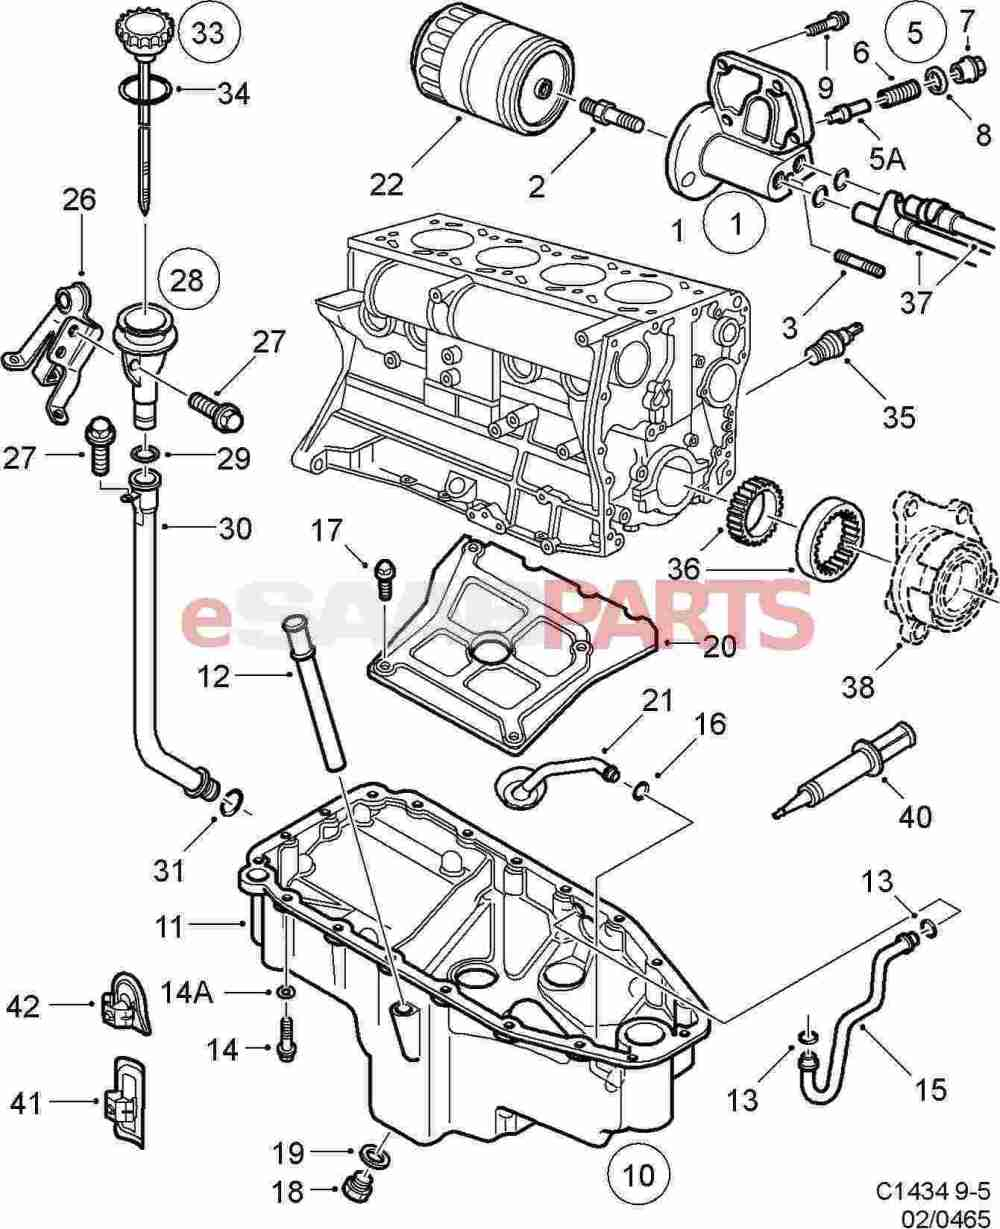 medium resolution of saab 2000 9 5 engine diagram oil wiring diagrams value saab 9 5 engine parts